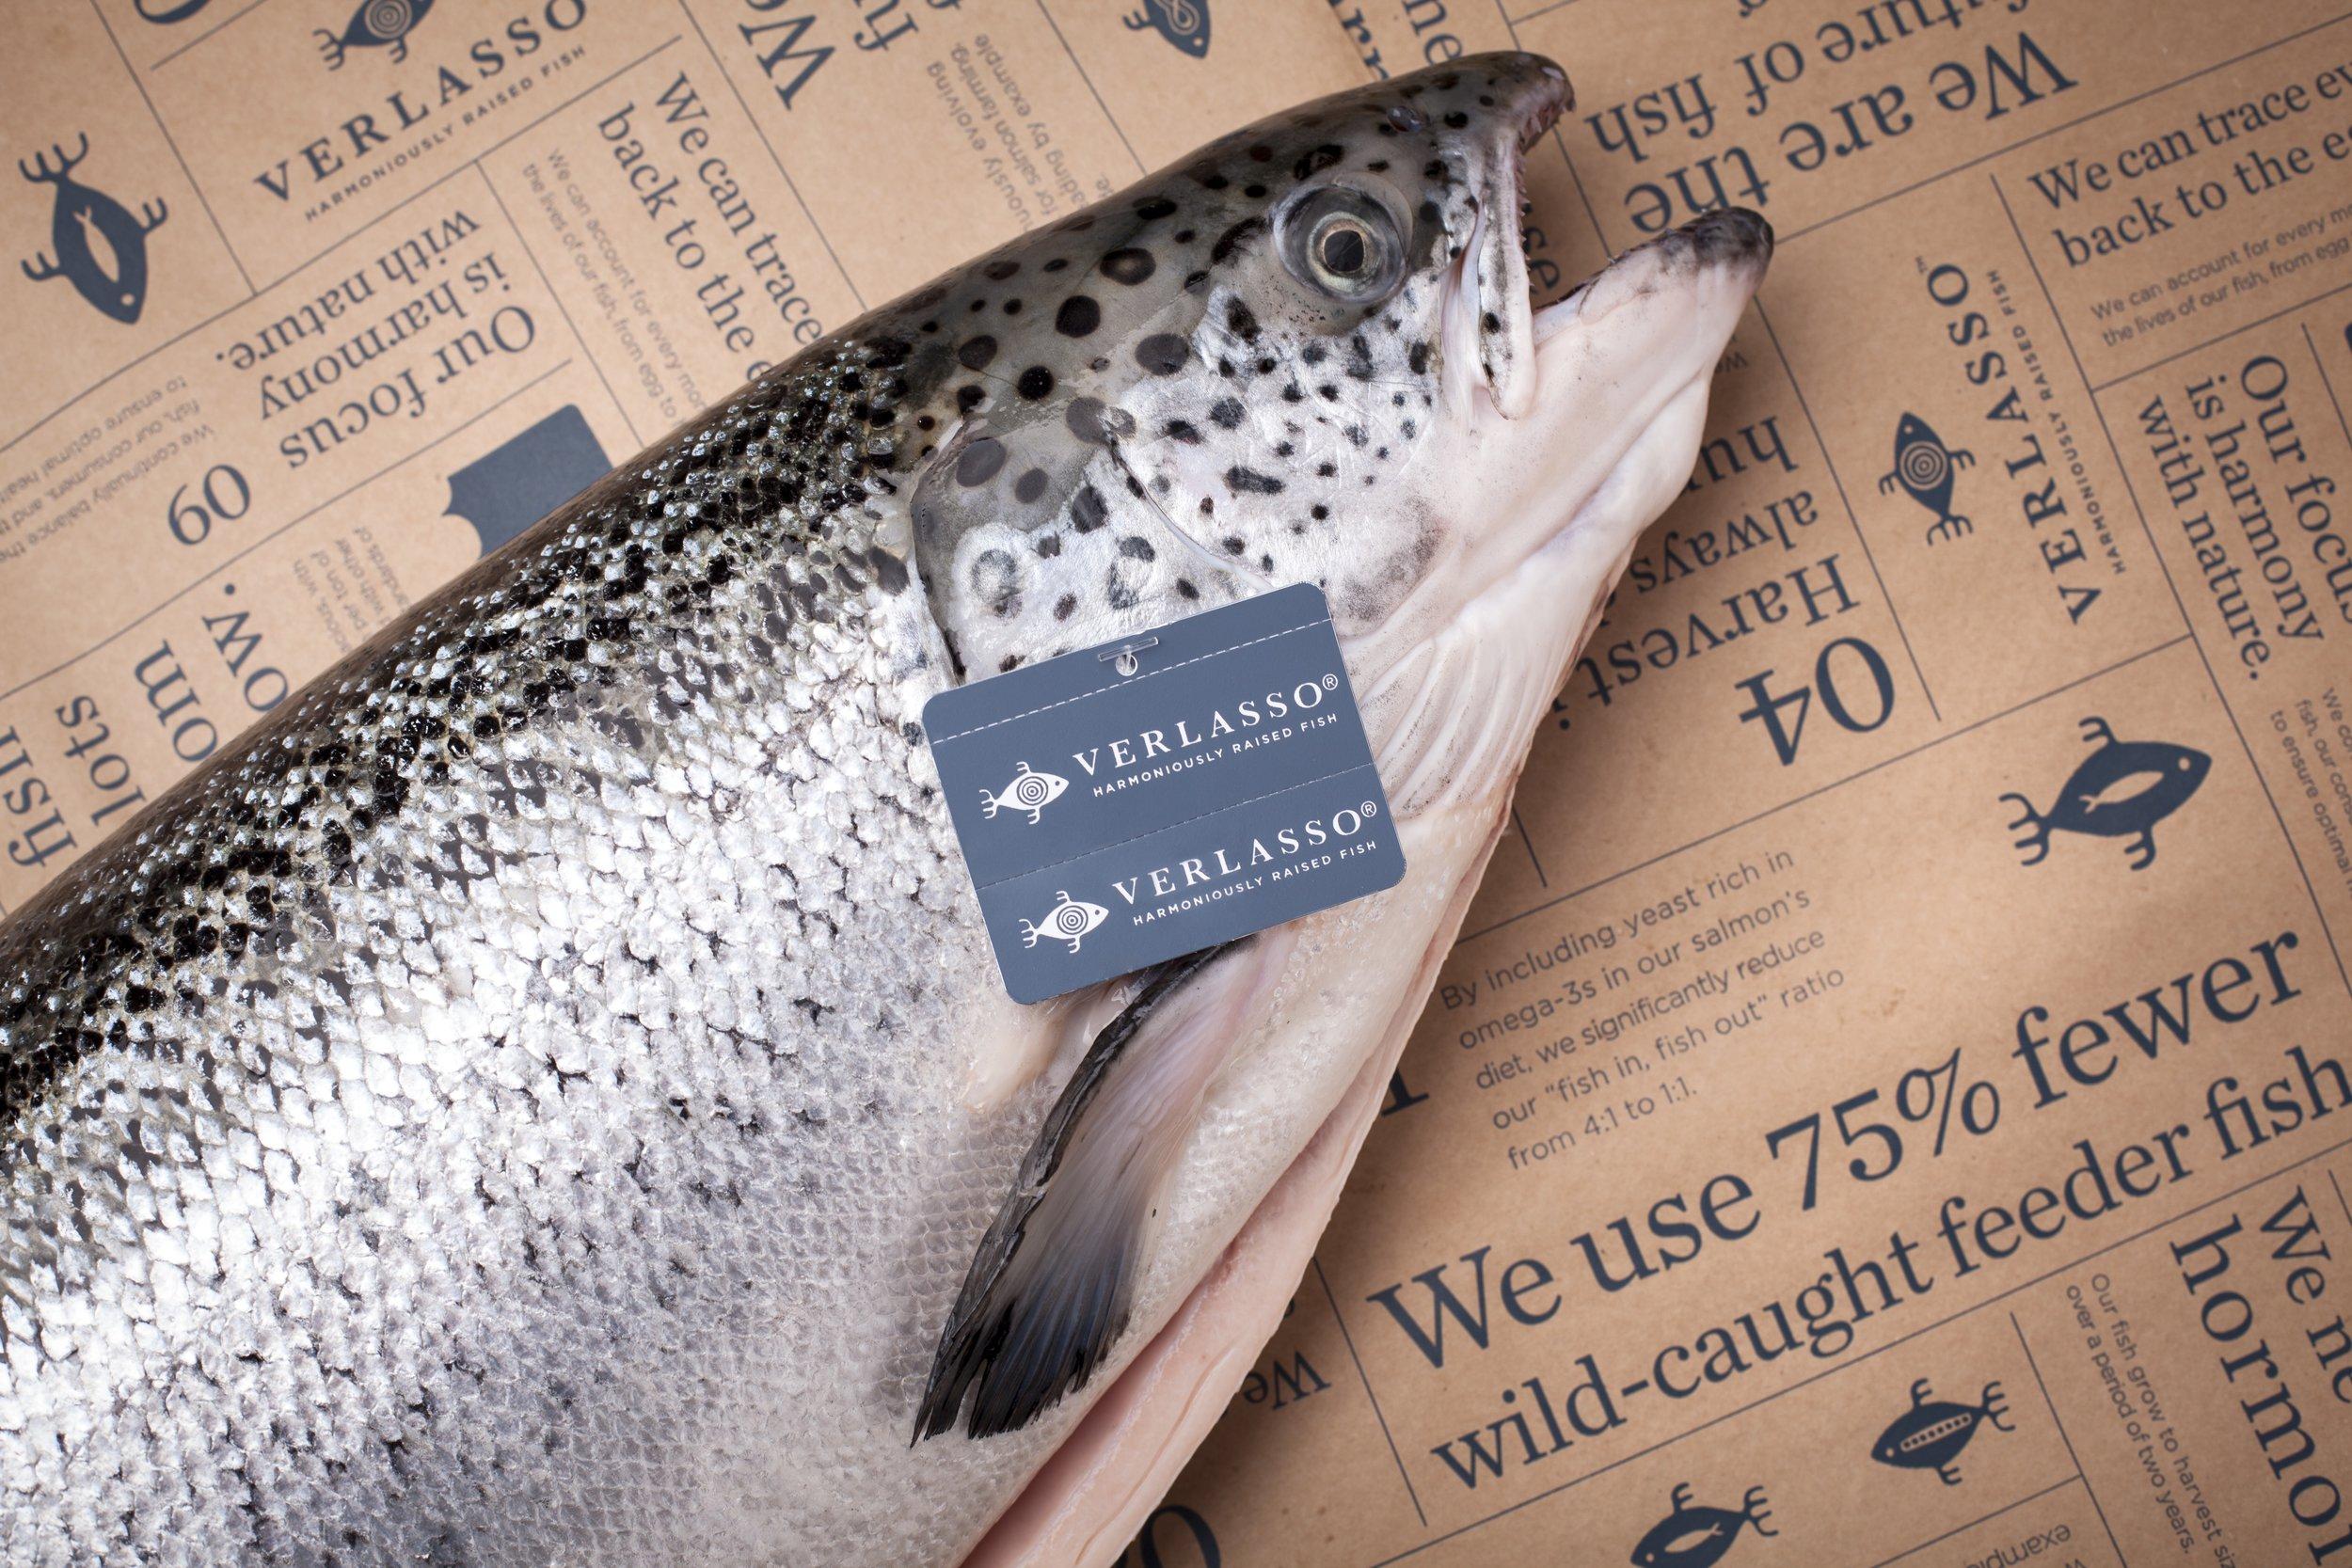 Verlasso salmon with tag